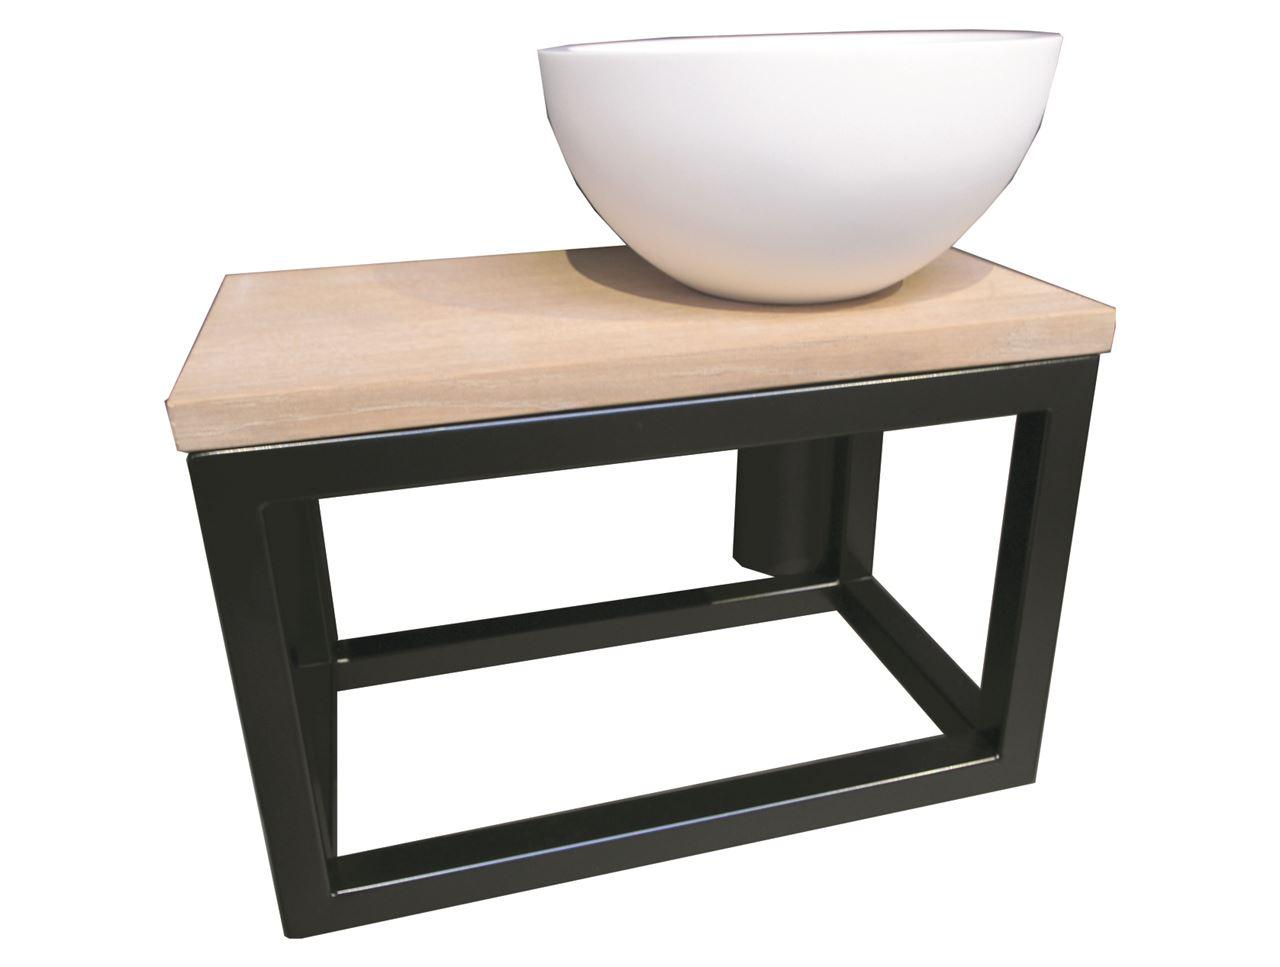 Zwarte Kraan Toilet : Sc design fonteinset mat zwart stone company